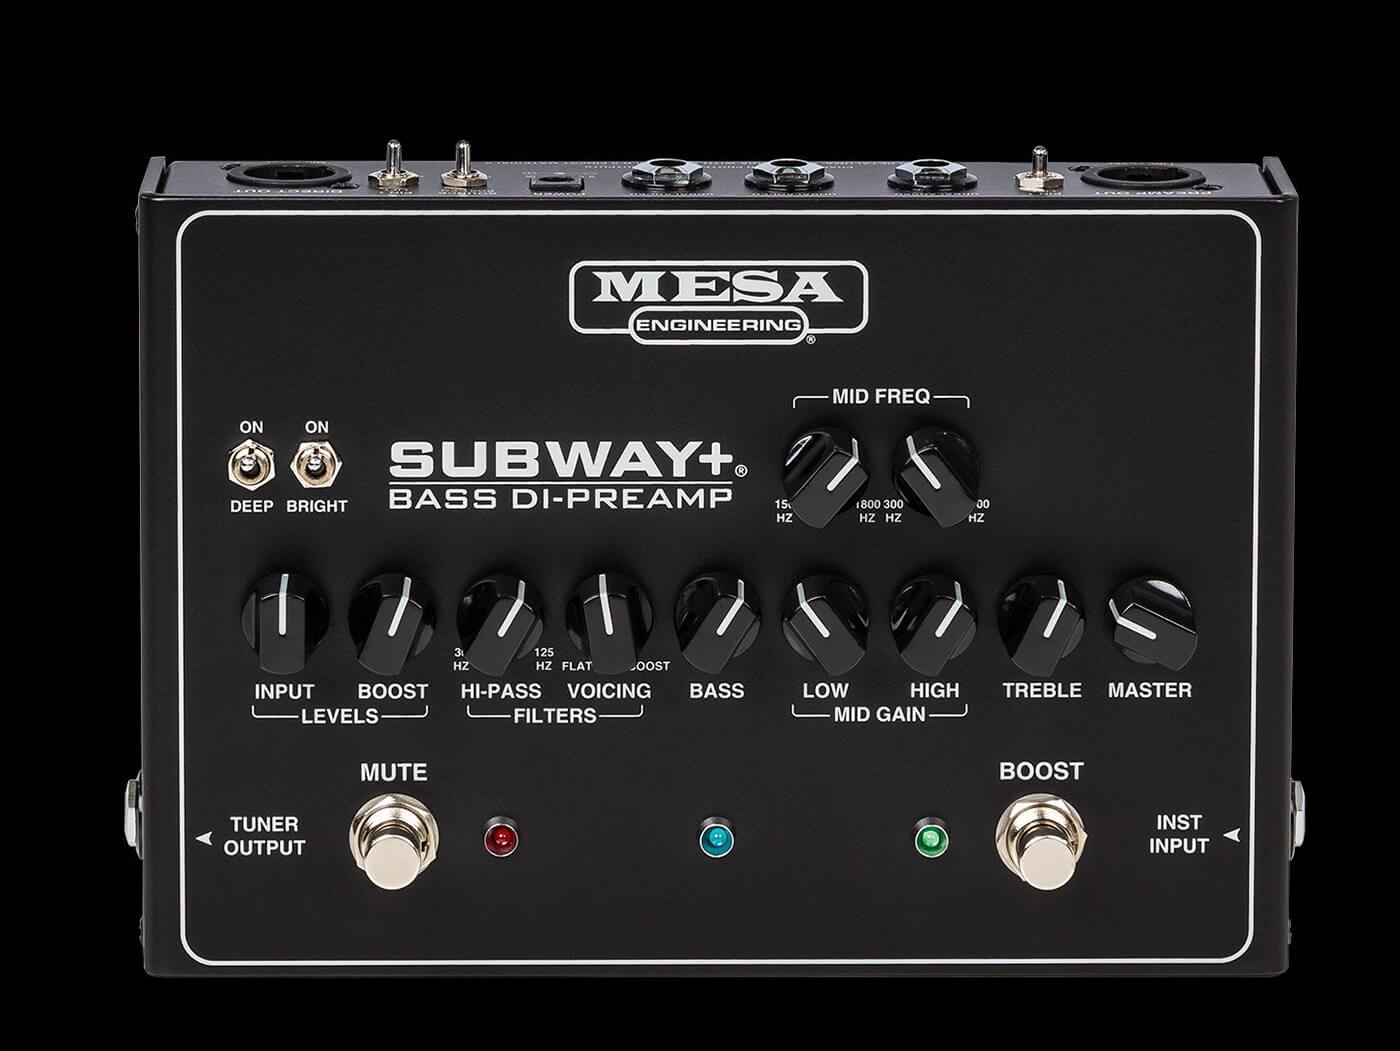 Mesa Boogie Subway Plus Bass DI-premap